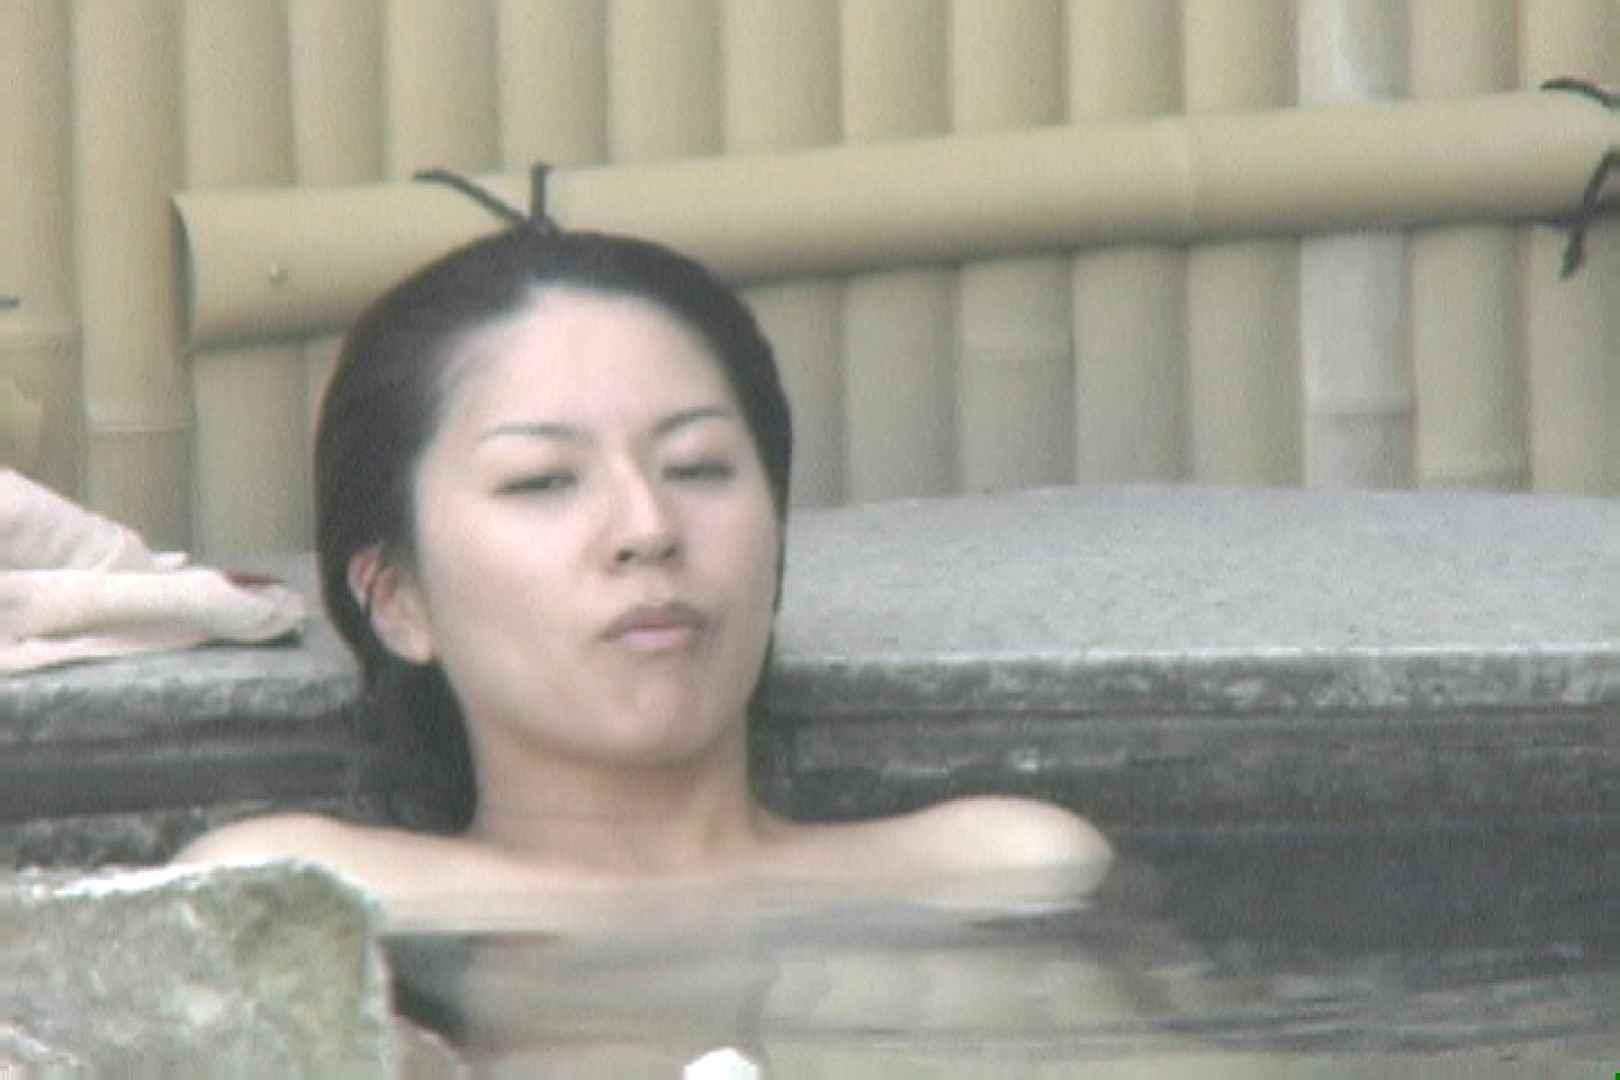 Aquaな露天風呂Vol.694 露天風呂編 | 盗撮シリーズ  83PIX 37